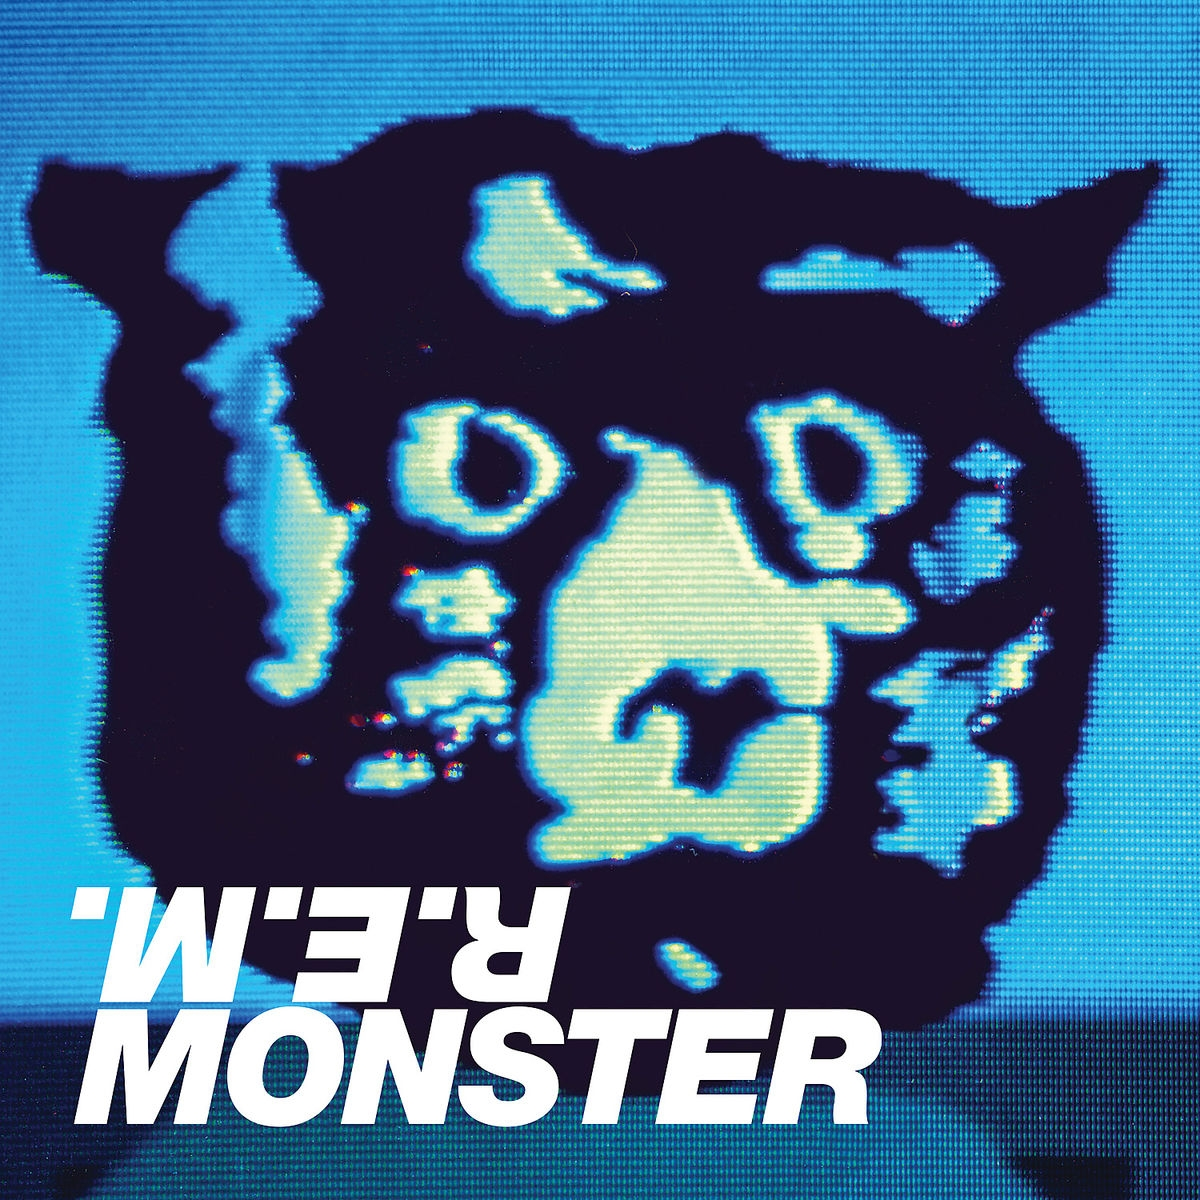 Monster (25th Anniversary) - R.E.M. - Musik - UNIVERSAL - 0888072111493 - 1/11-2019